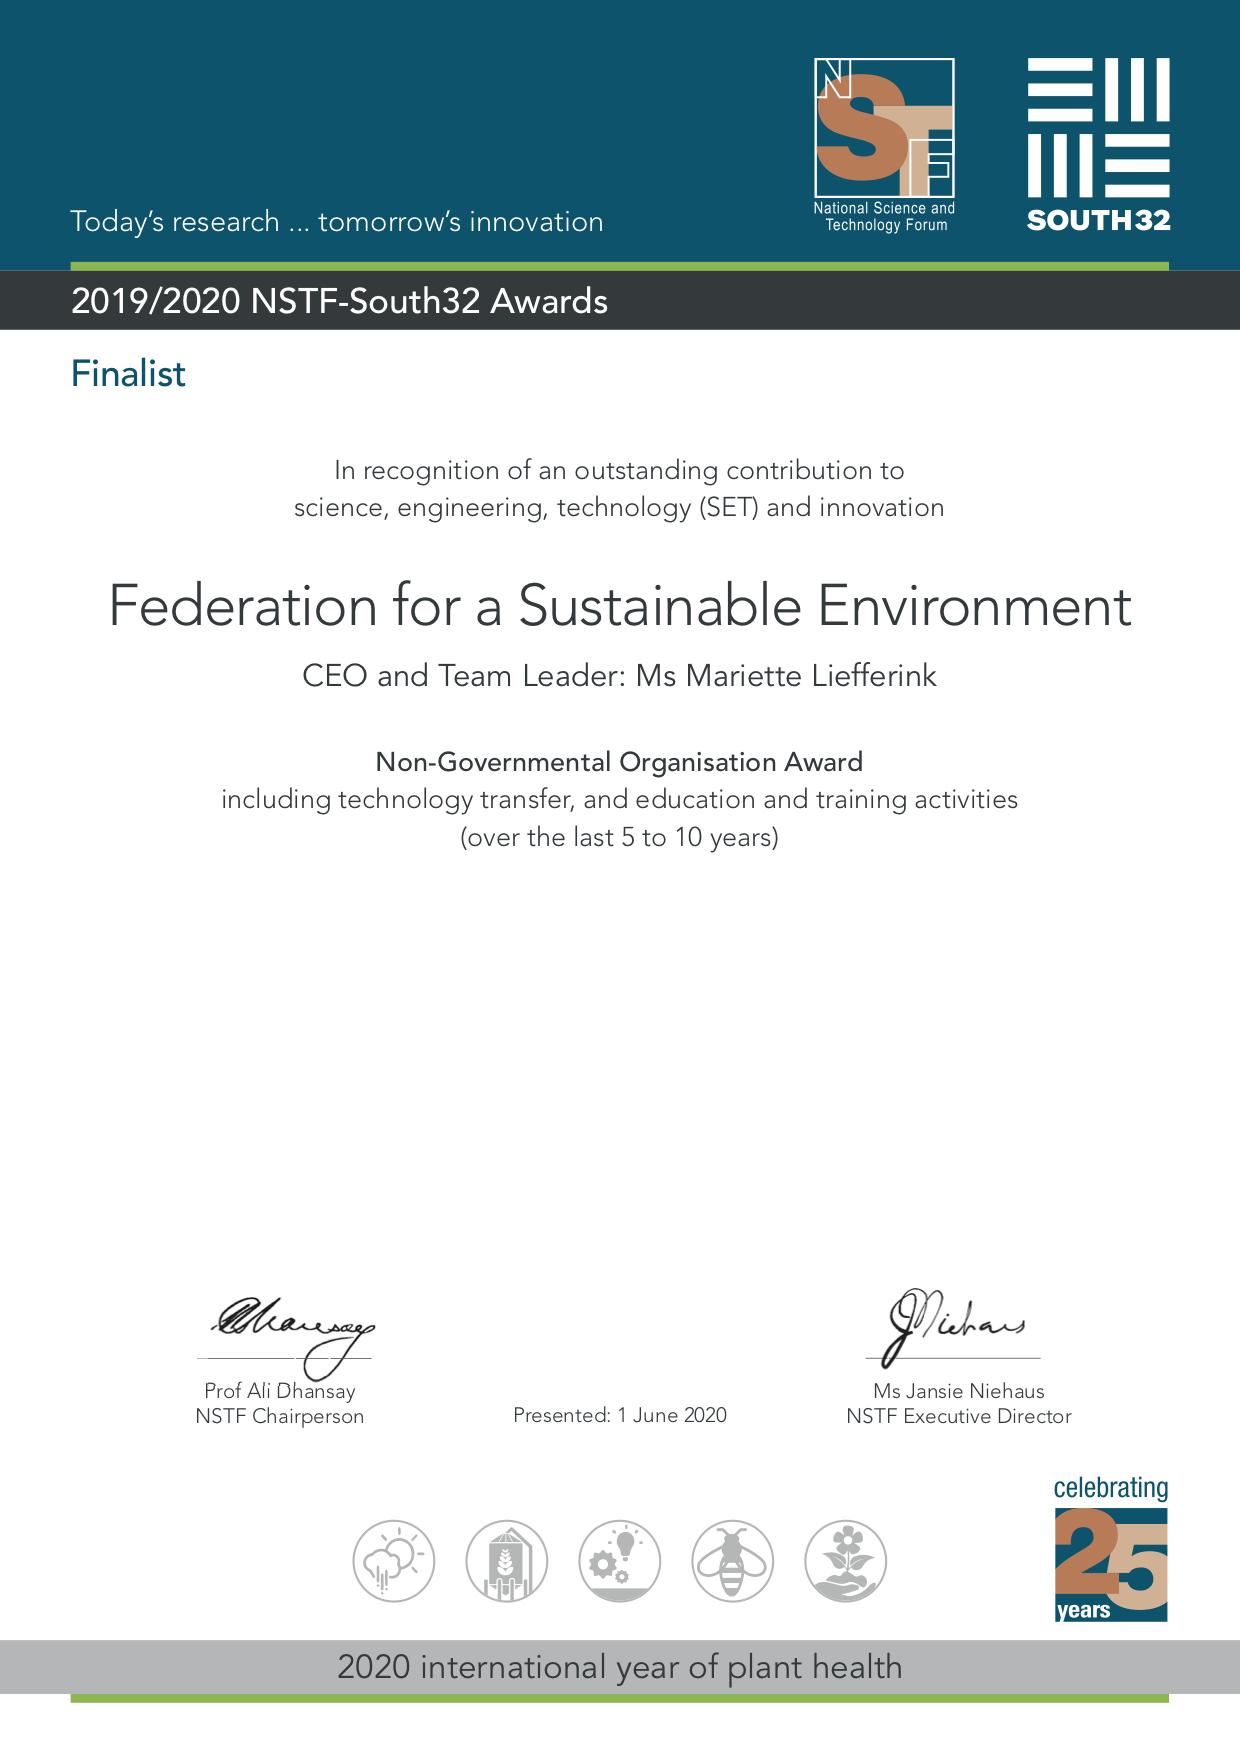 FSE- Finalist: 2019/2020 NSTF-South32 Awards